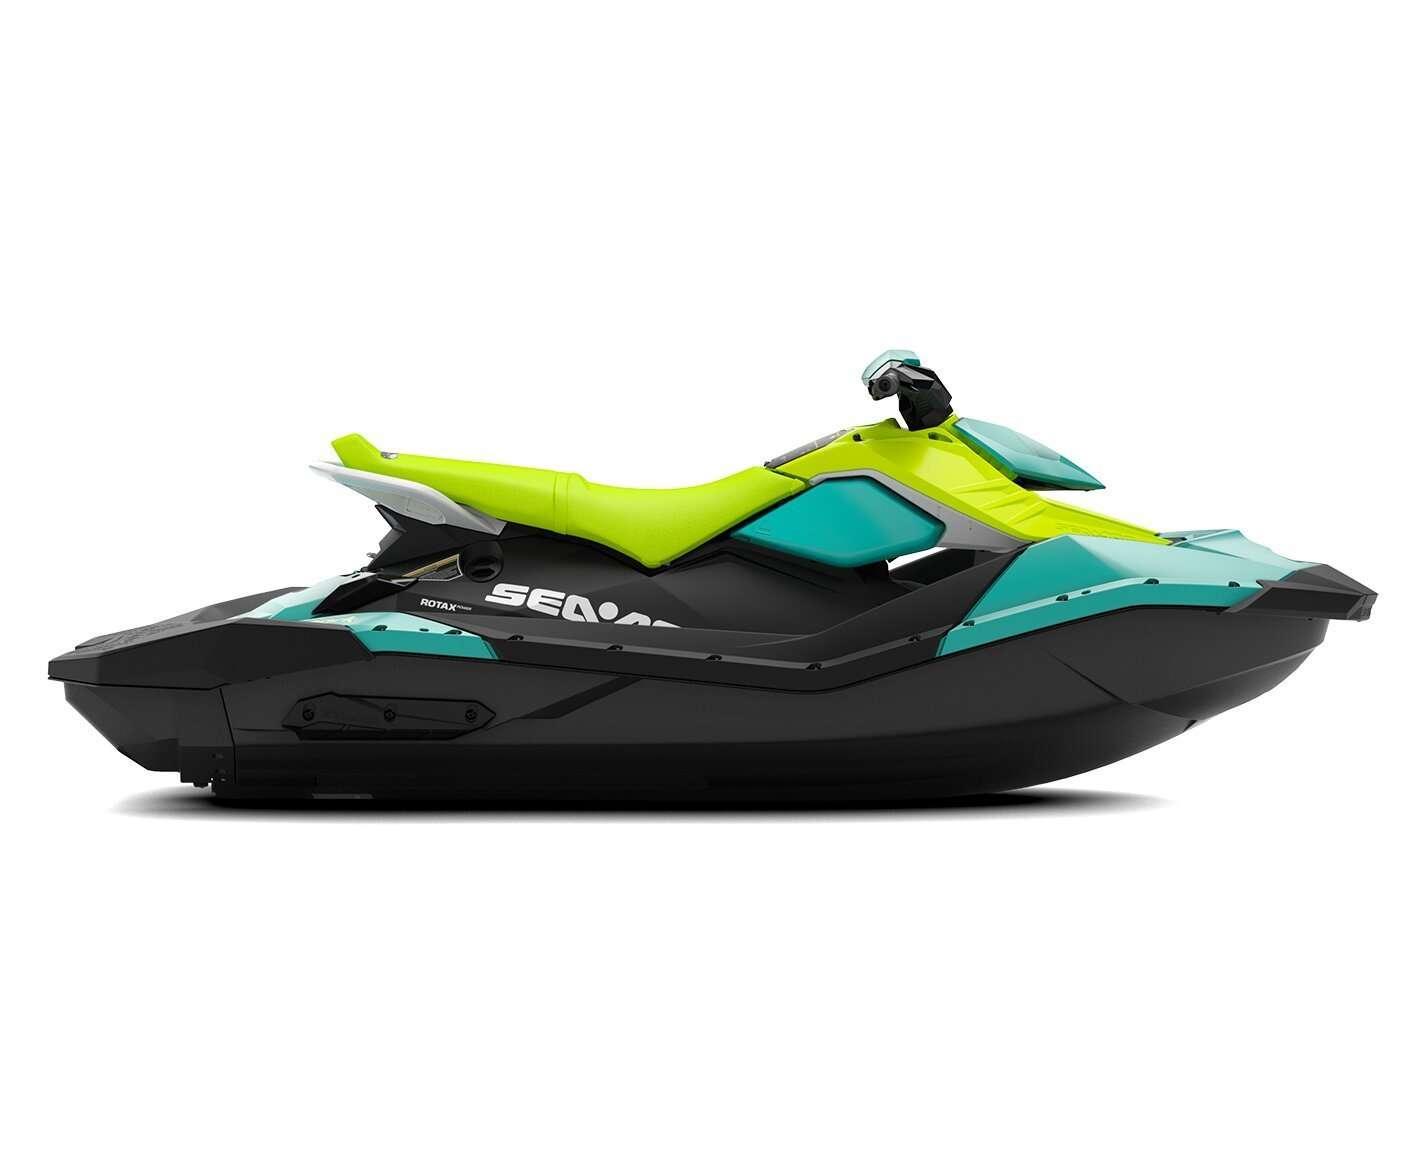 Comprar moto de agua Sea-Doo Spark 2 Up en Barcelona